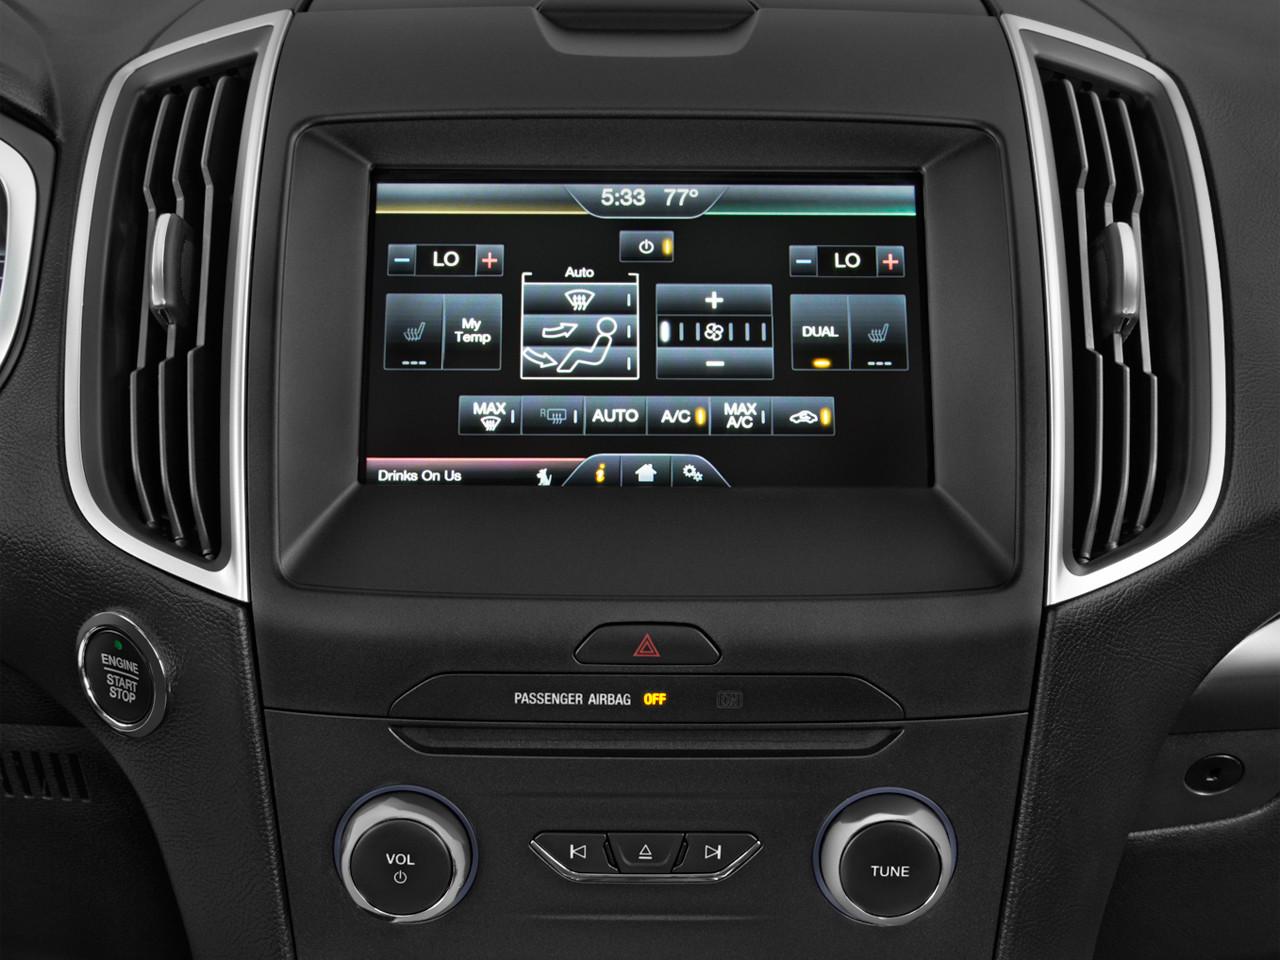 2016 ford mustang interior u s news amp world report - 2016 Ford Mustang Interior U S News Amp World Report 22